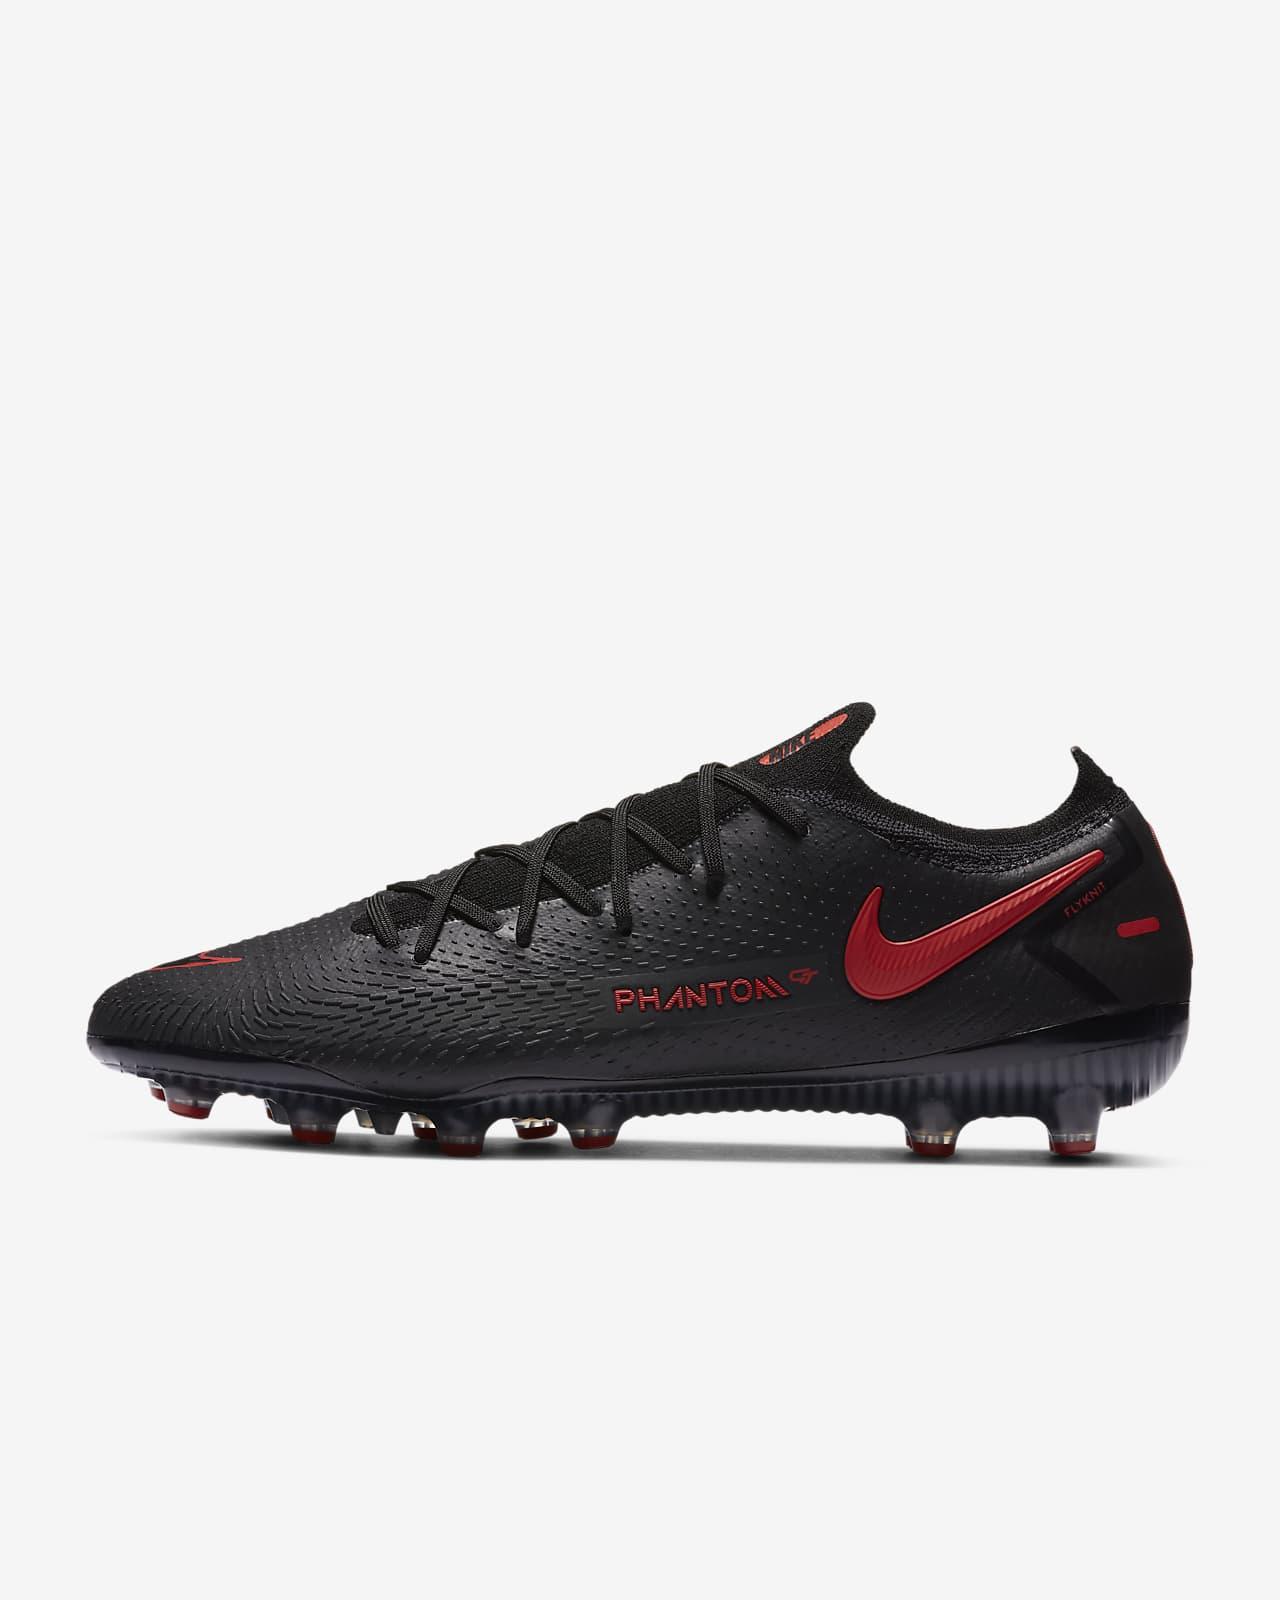 Scarpa da calcio per erba artificiale Nike Phantom GT Elite AG-Pro